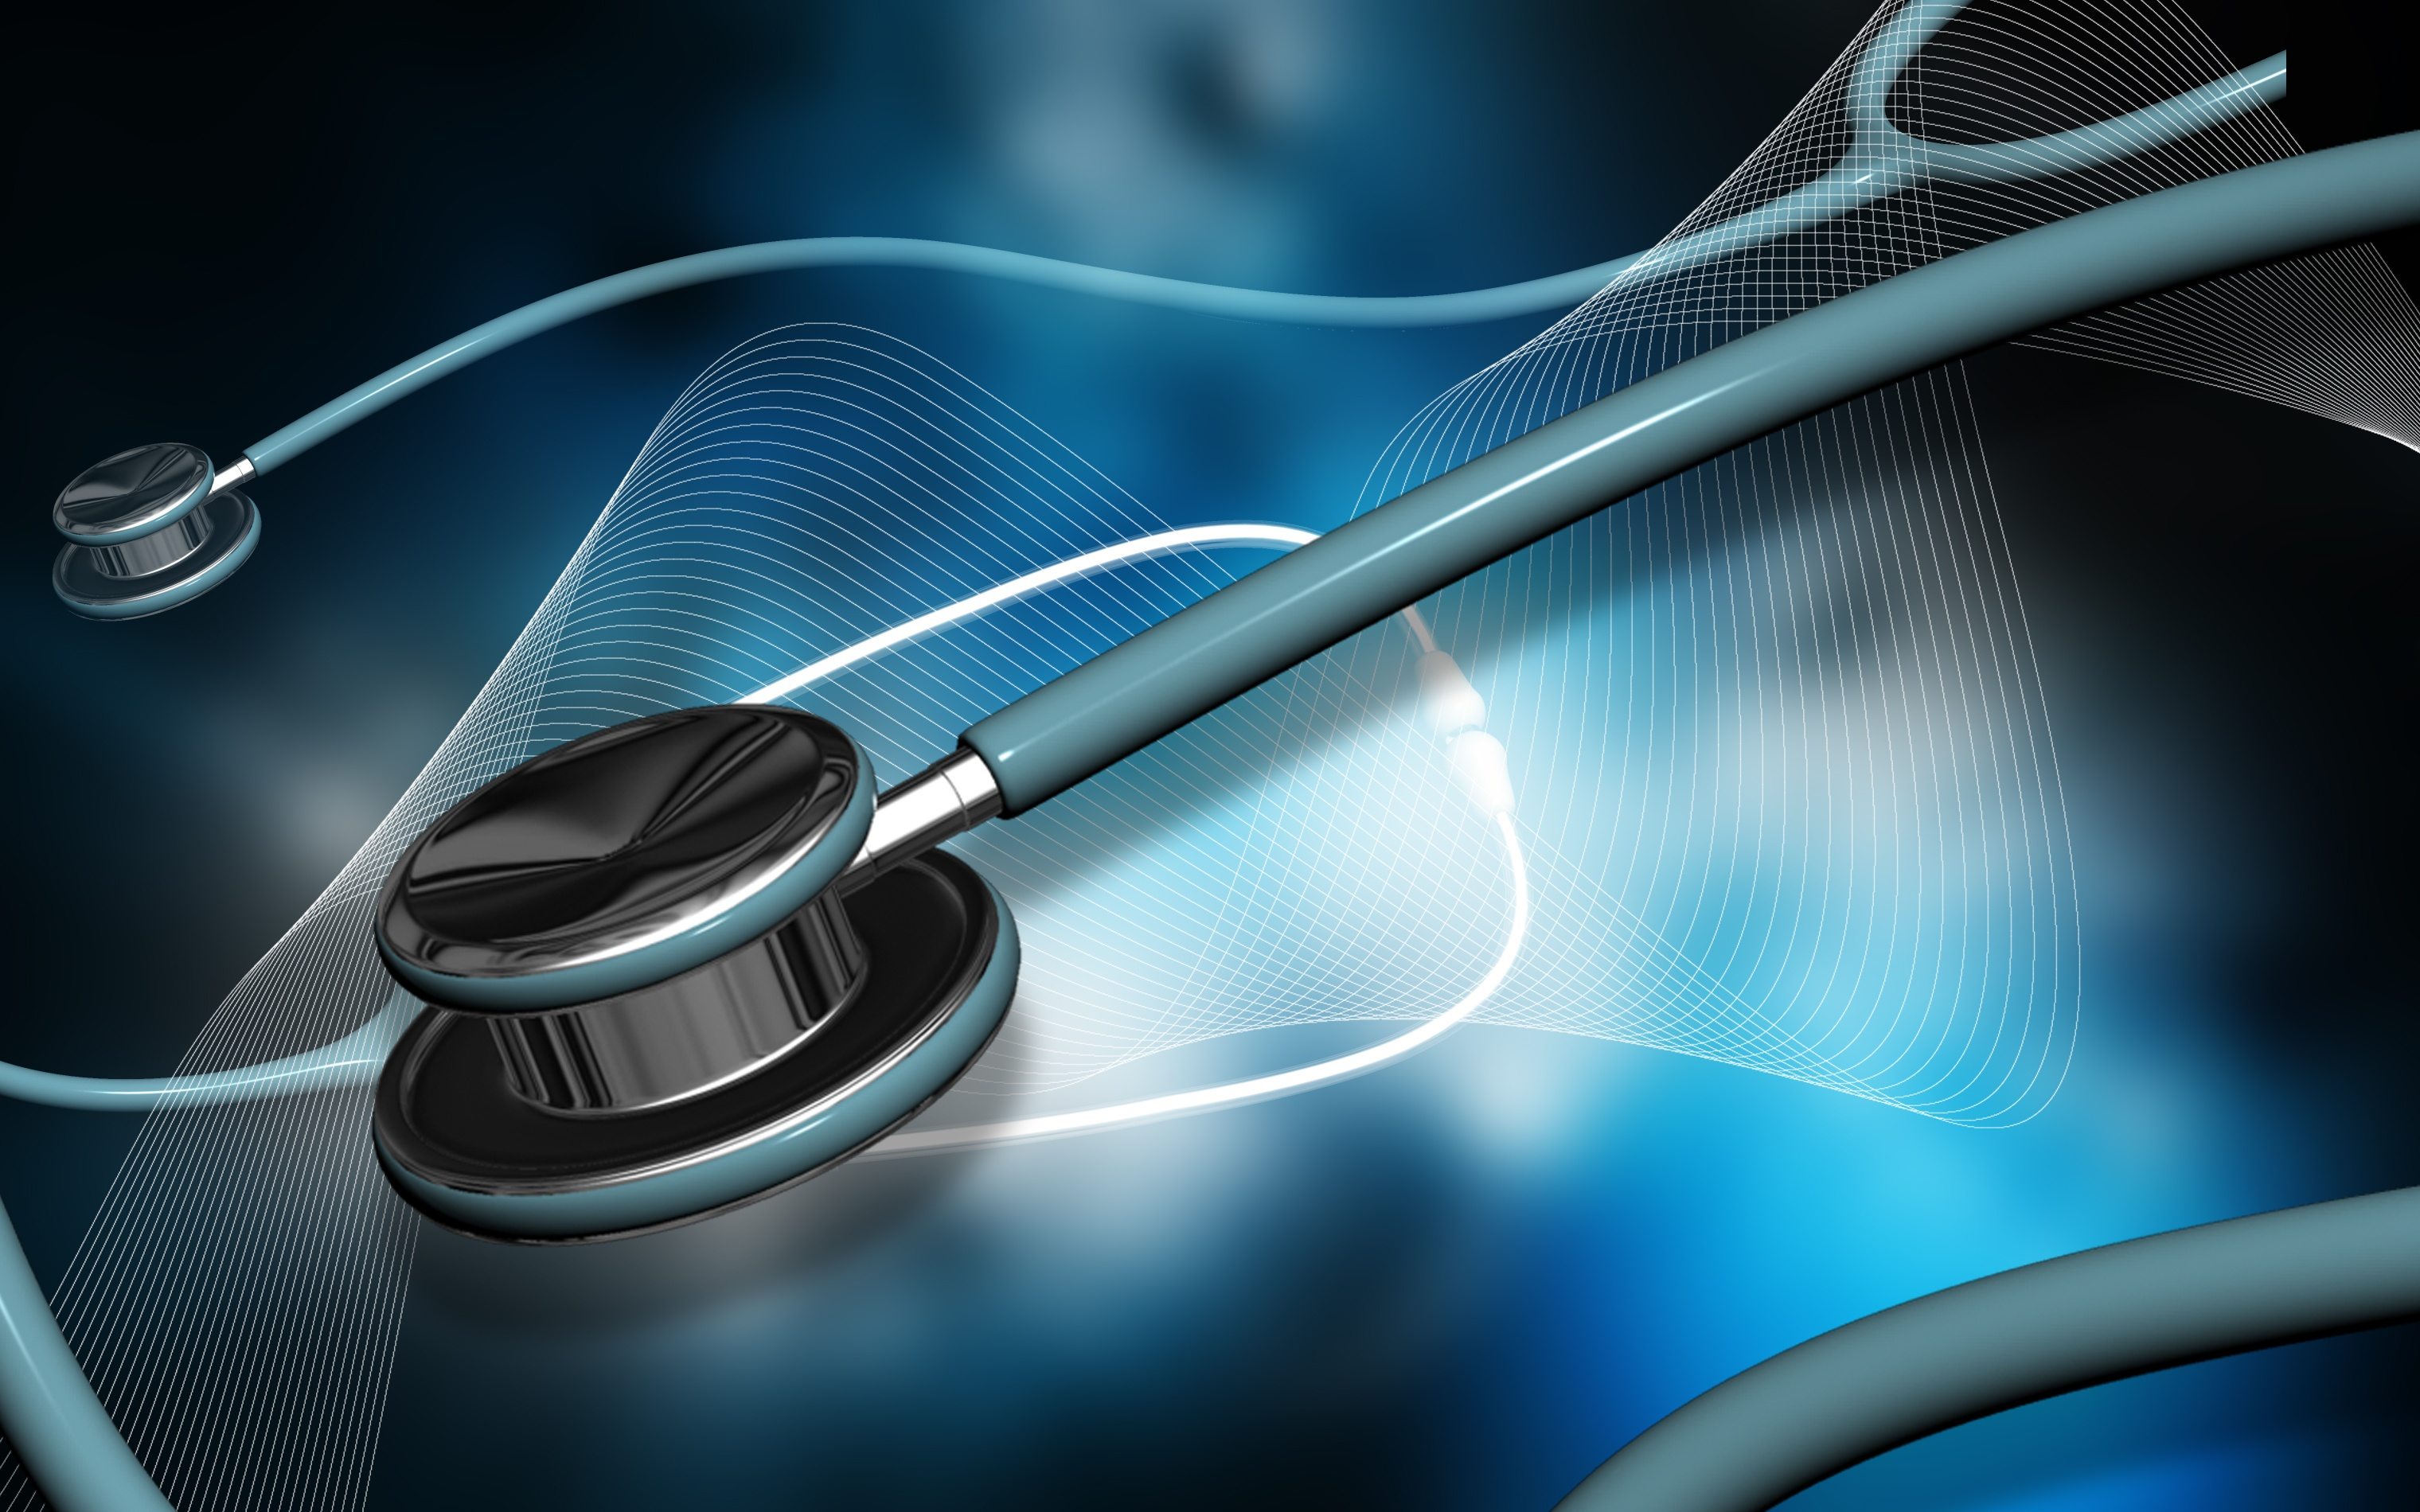 stockvault-stethoscope127462.jpg